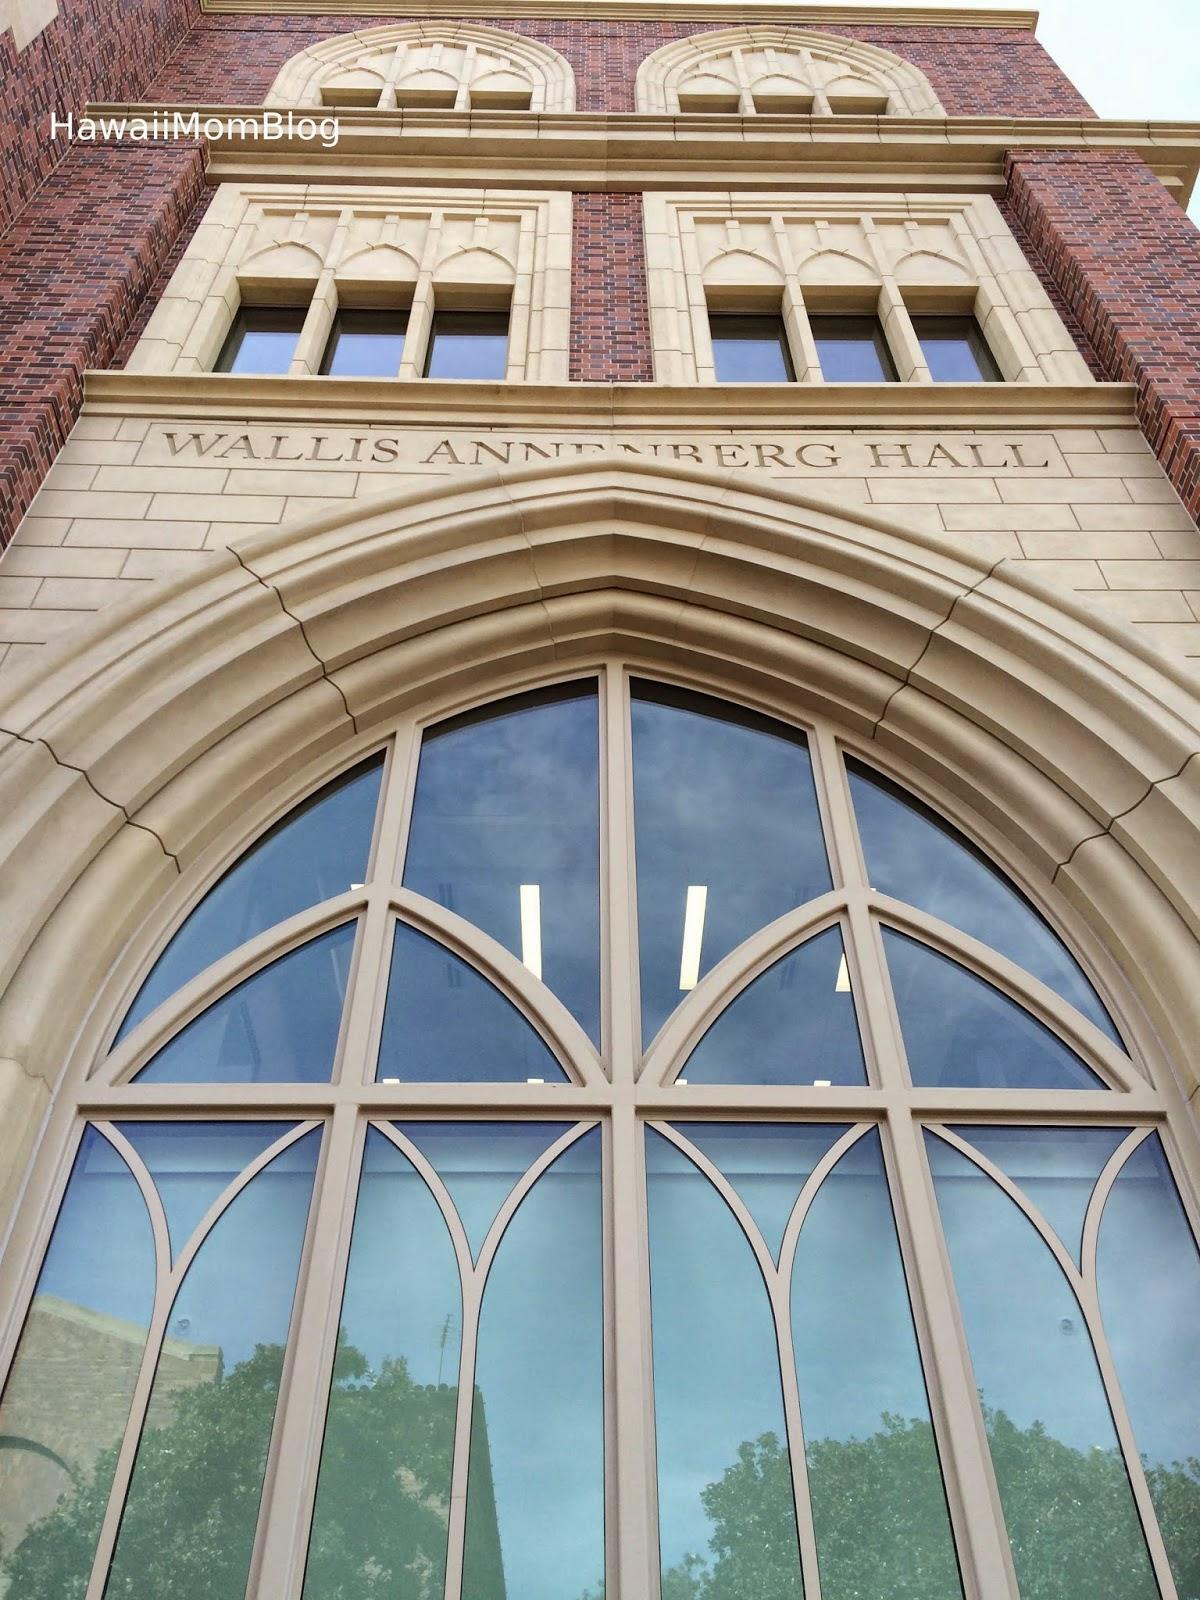 Hawaii Mom Blog: Visit Los Angeles: University of Southern California